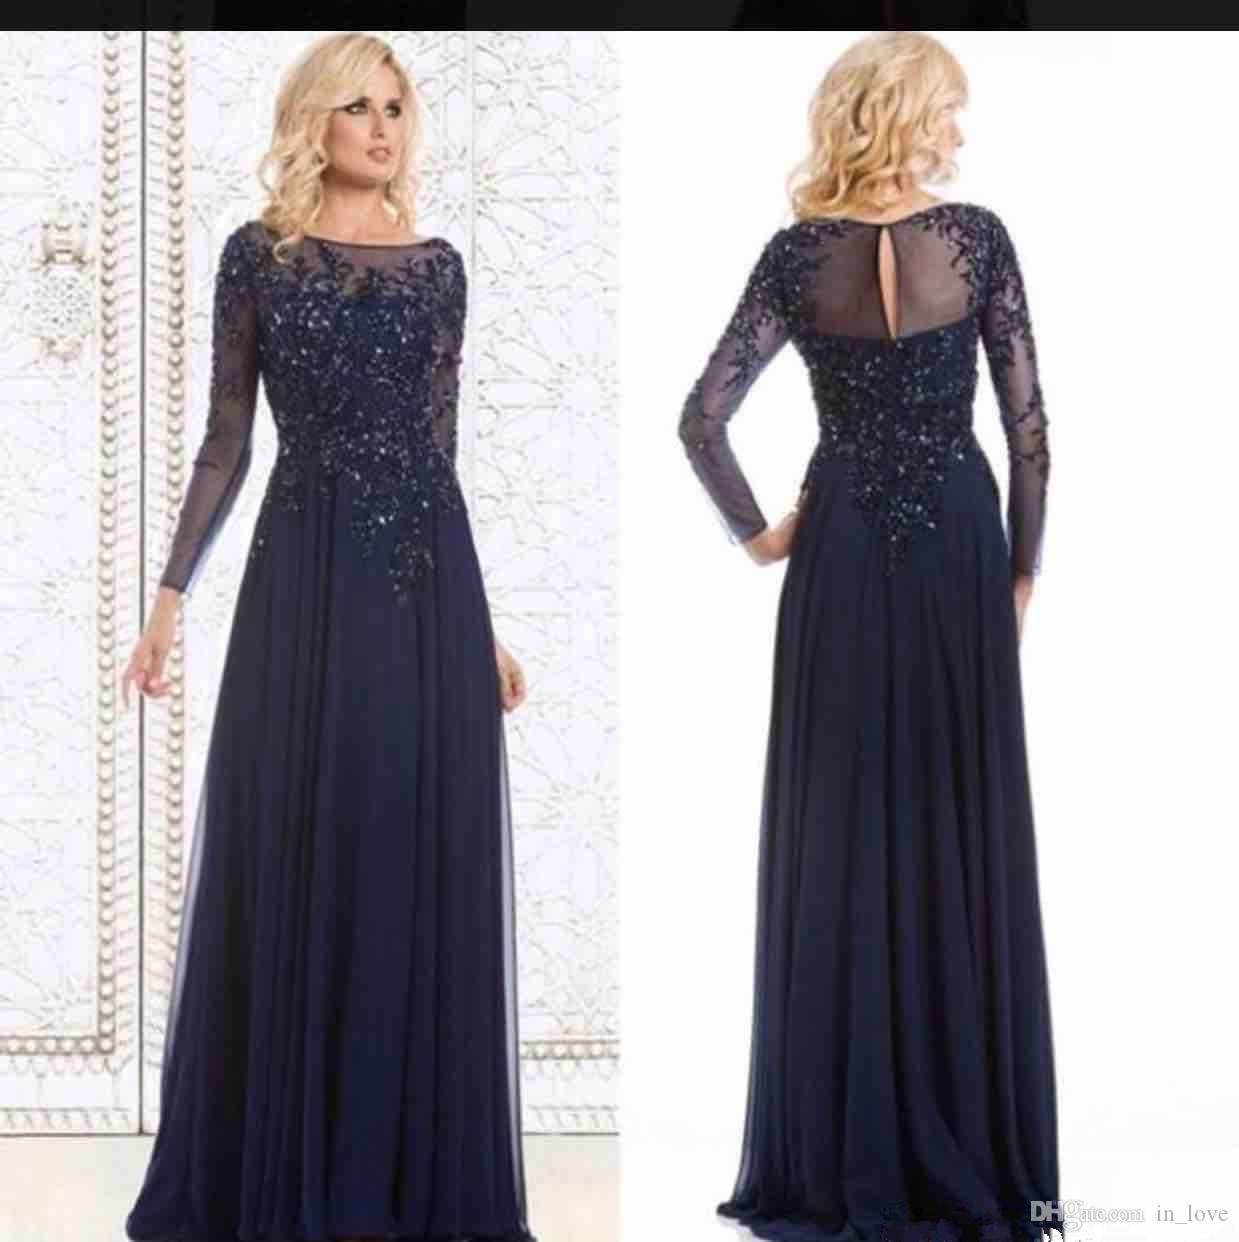 long navy dress for wedding, OFF 6%,Buy!